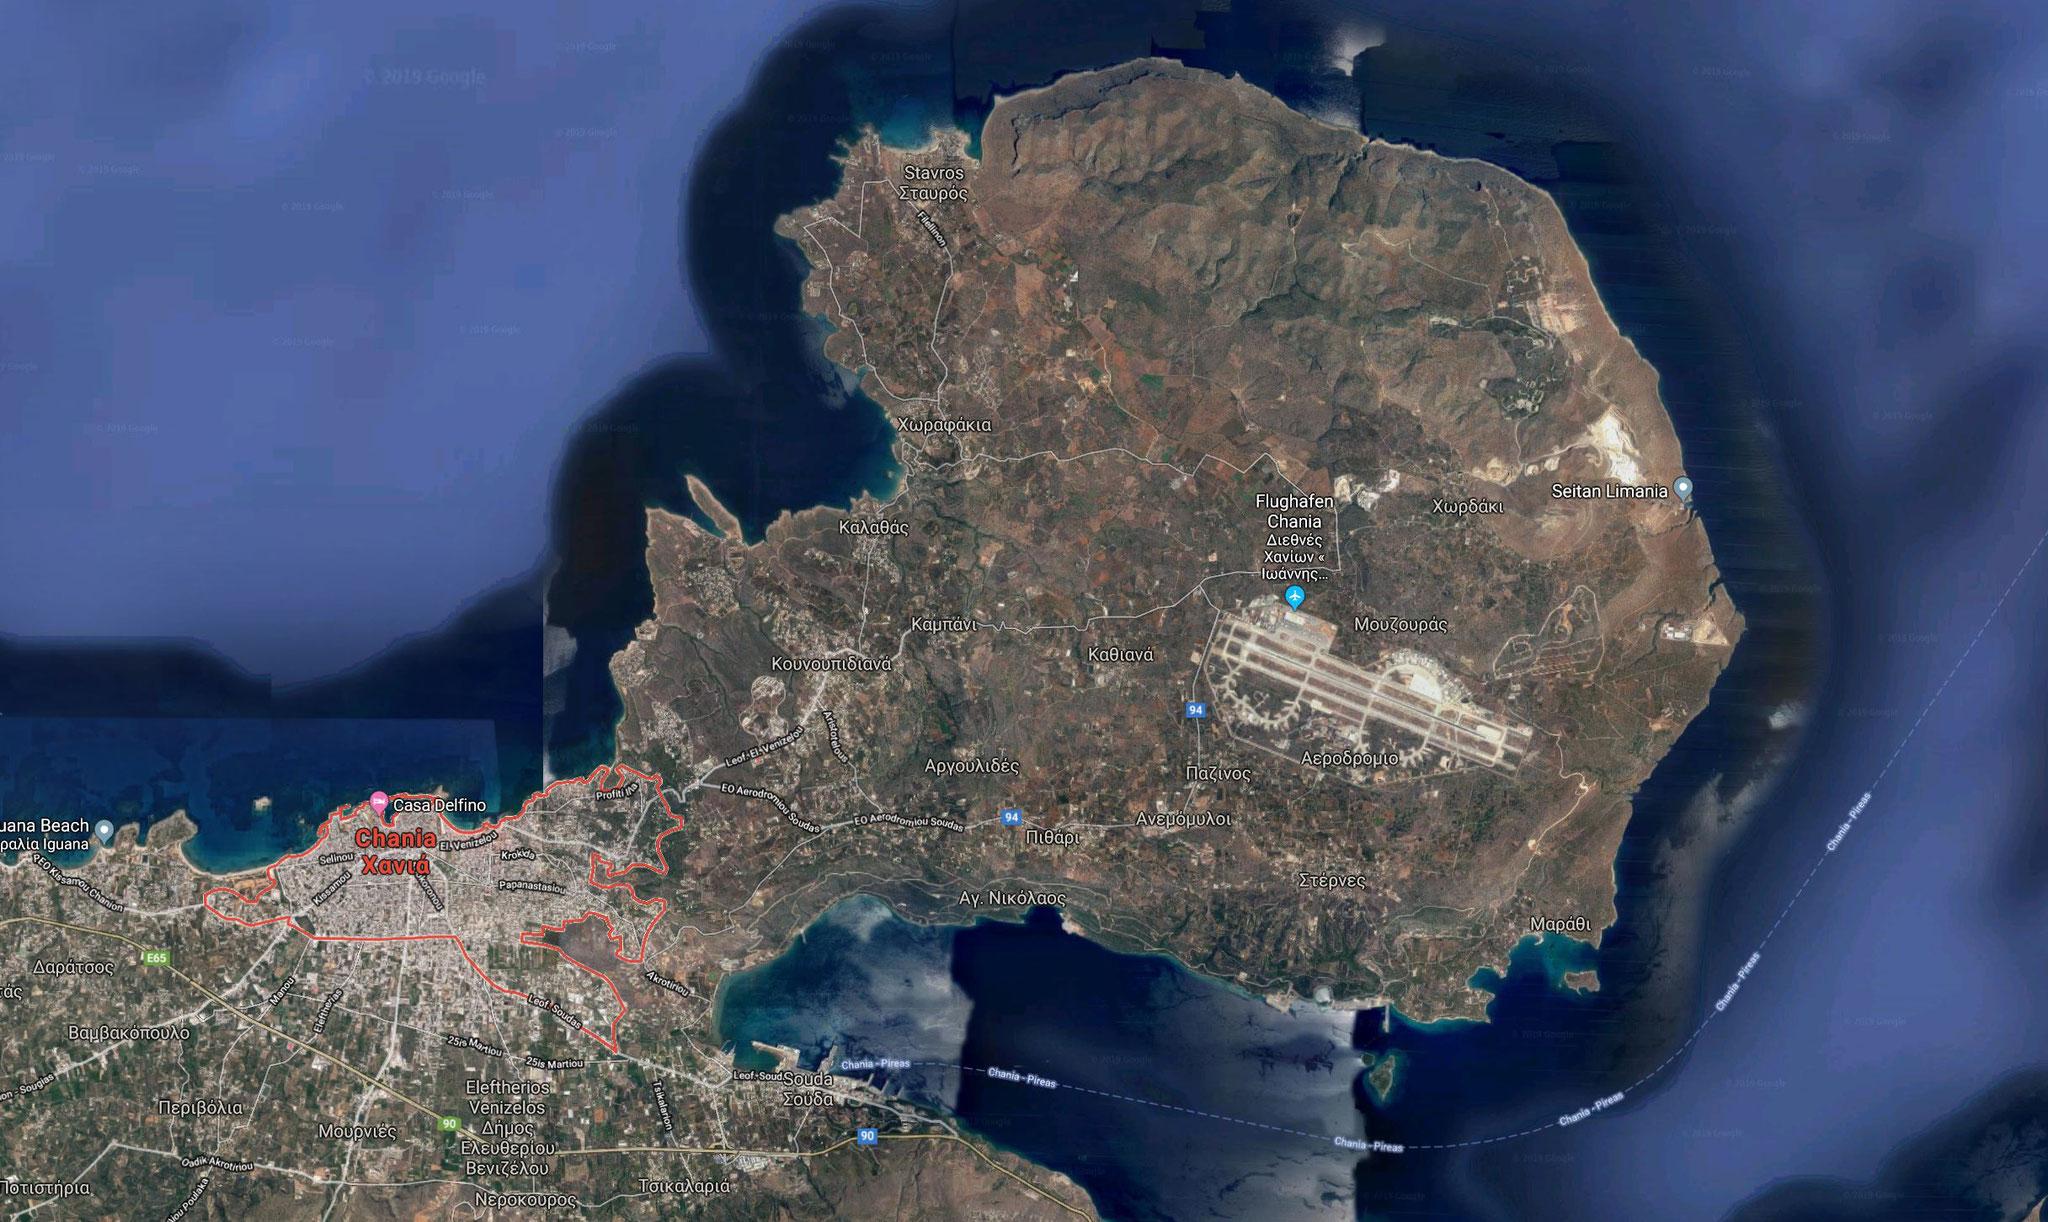 Chania auf Kreta - Griechenland, Katamatan Lagoon 42